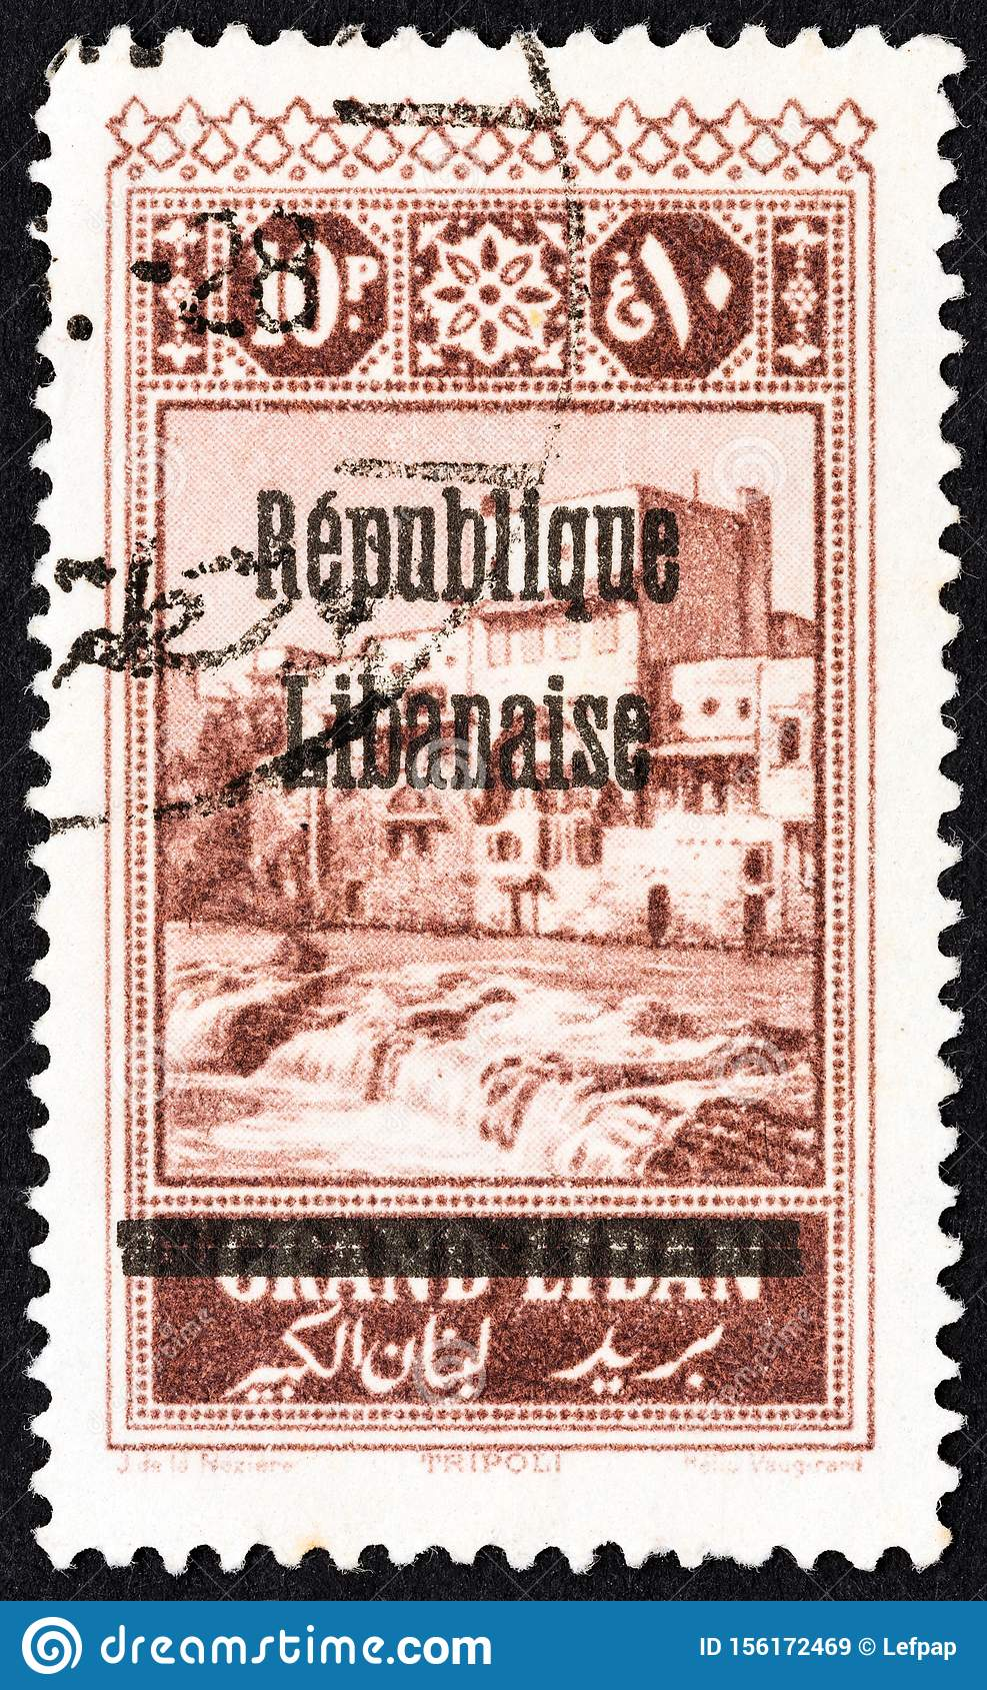 LEBANON - CIRCA 1927: A stamp printed in Lebanon shows Tripoli, circa 1927.